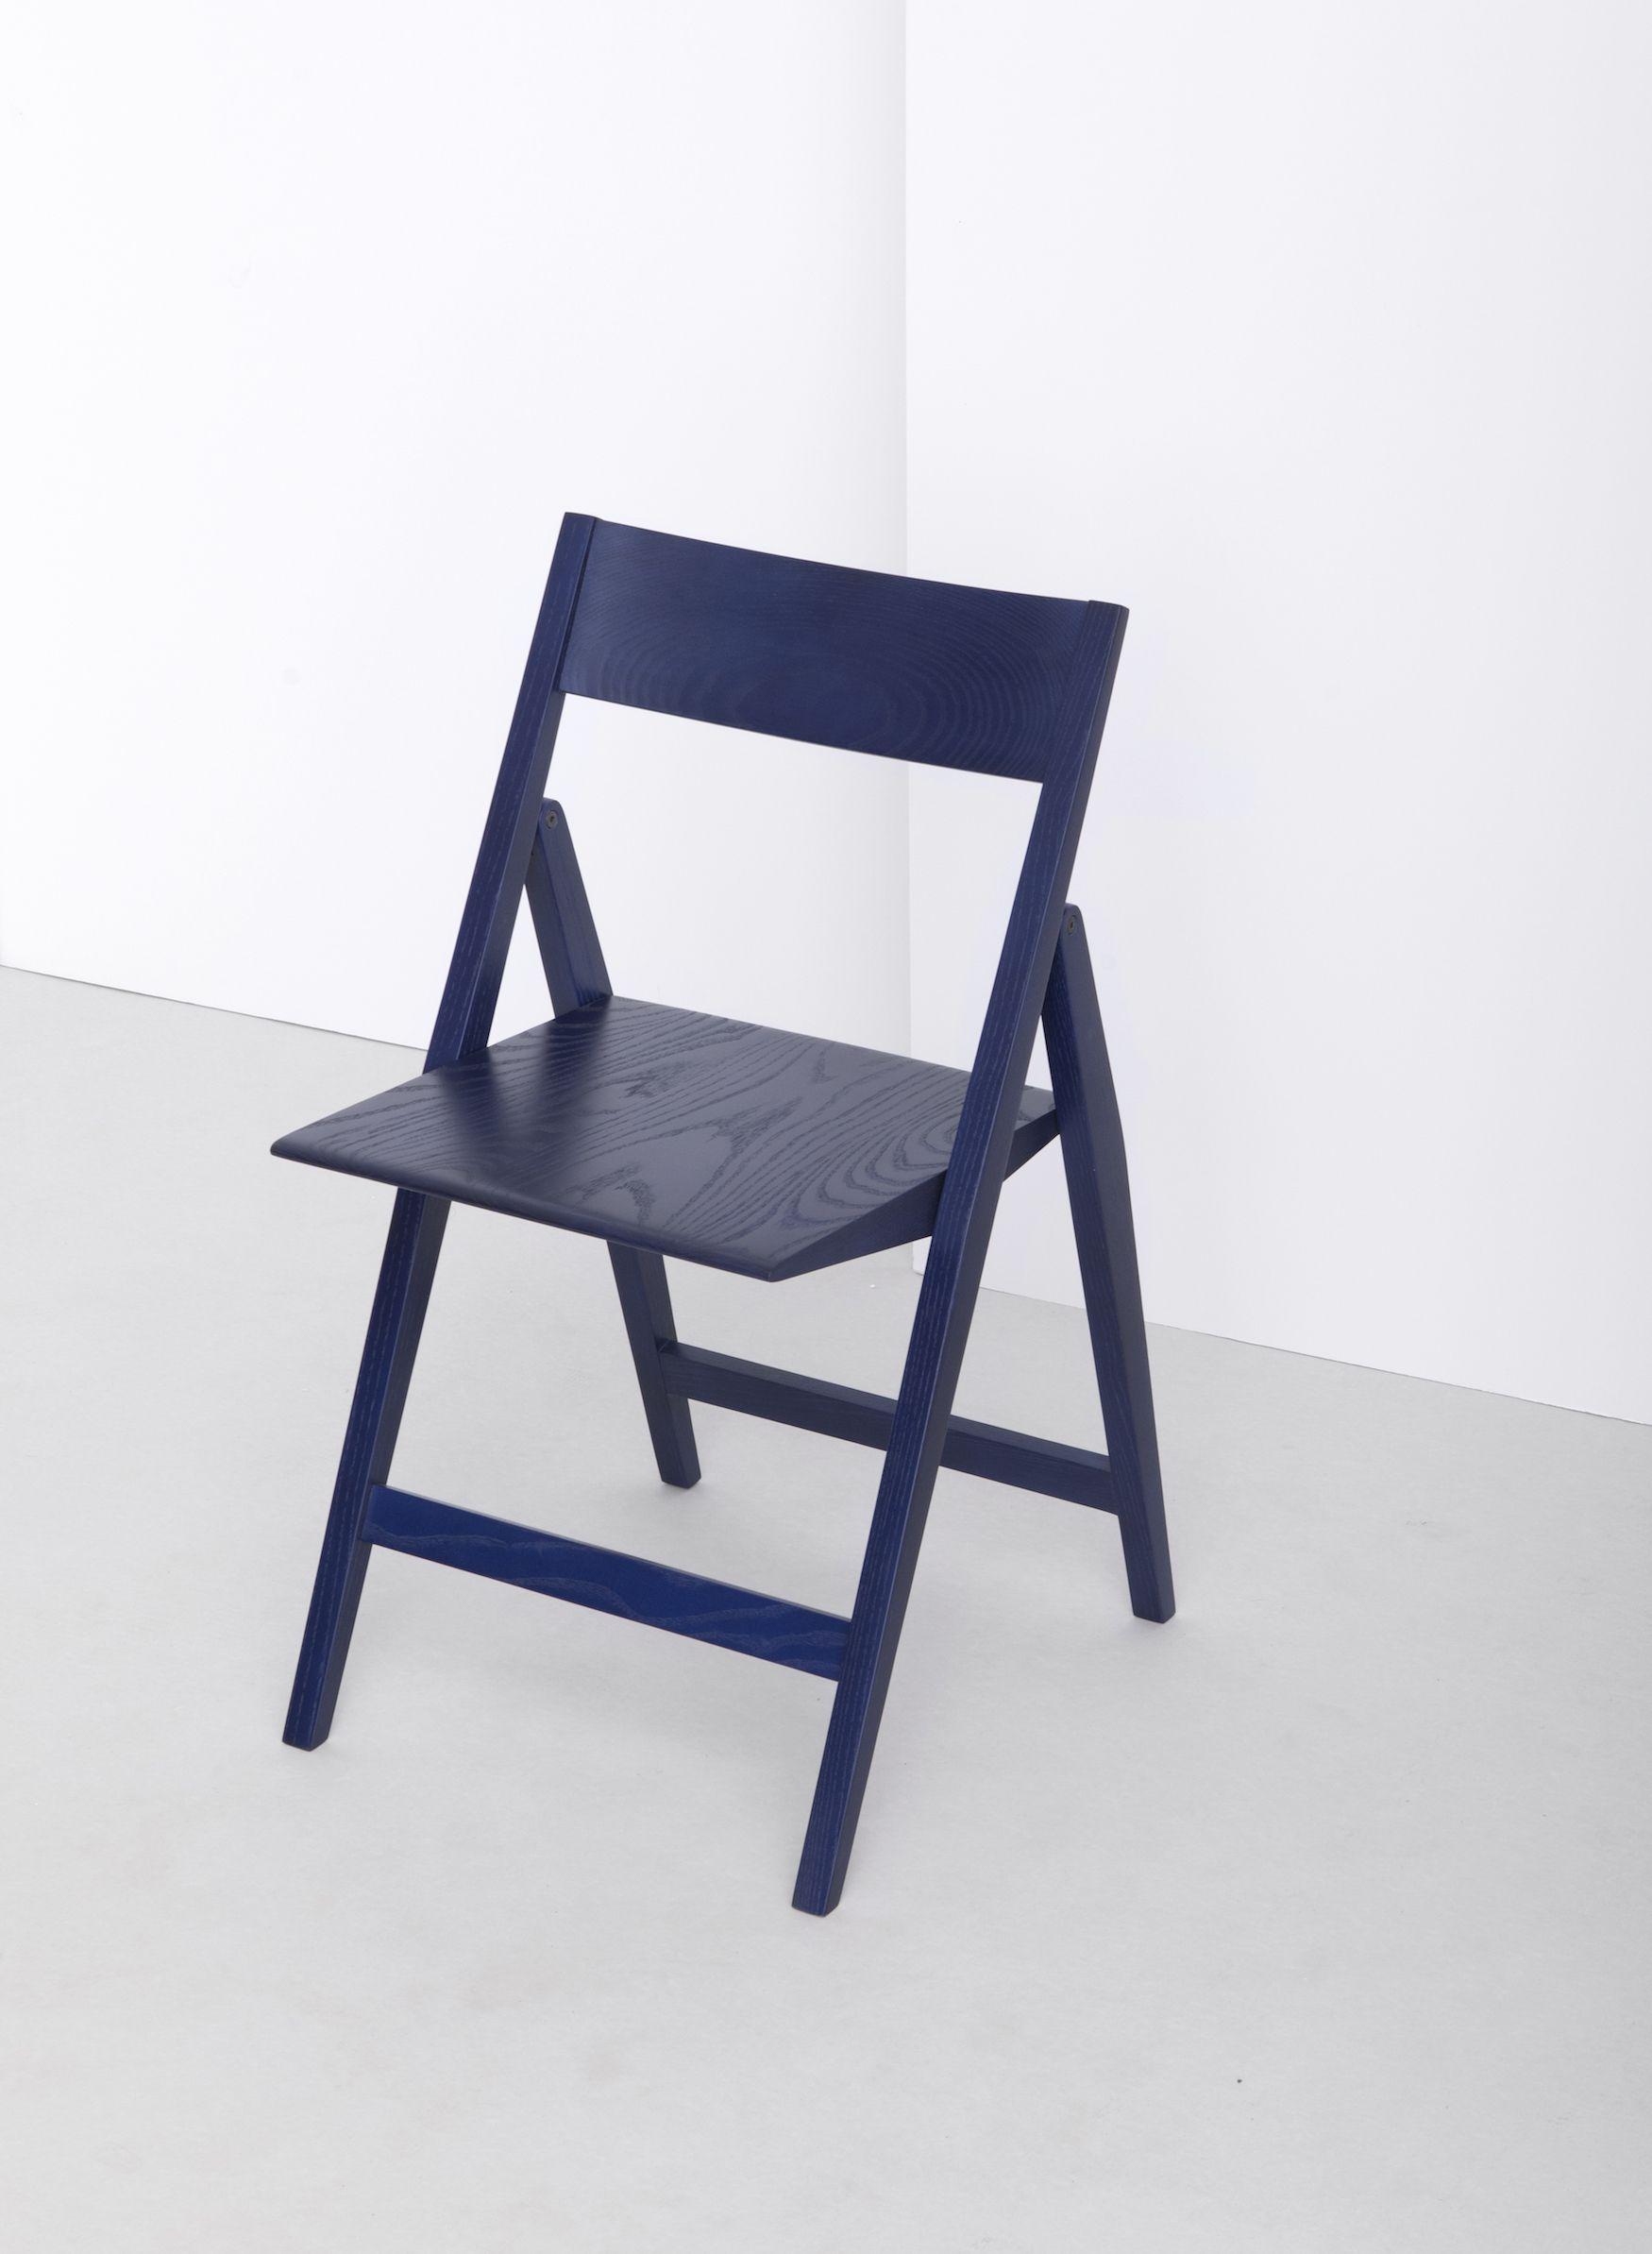 Compass folding chair folding chair chair cheap